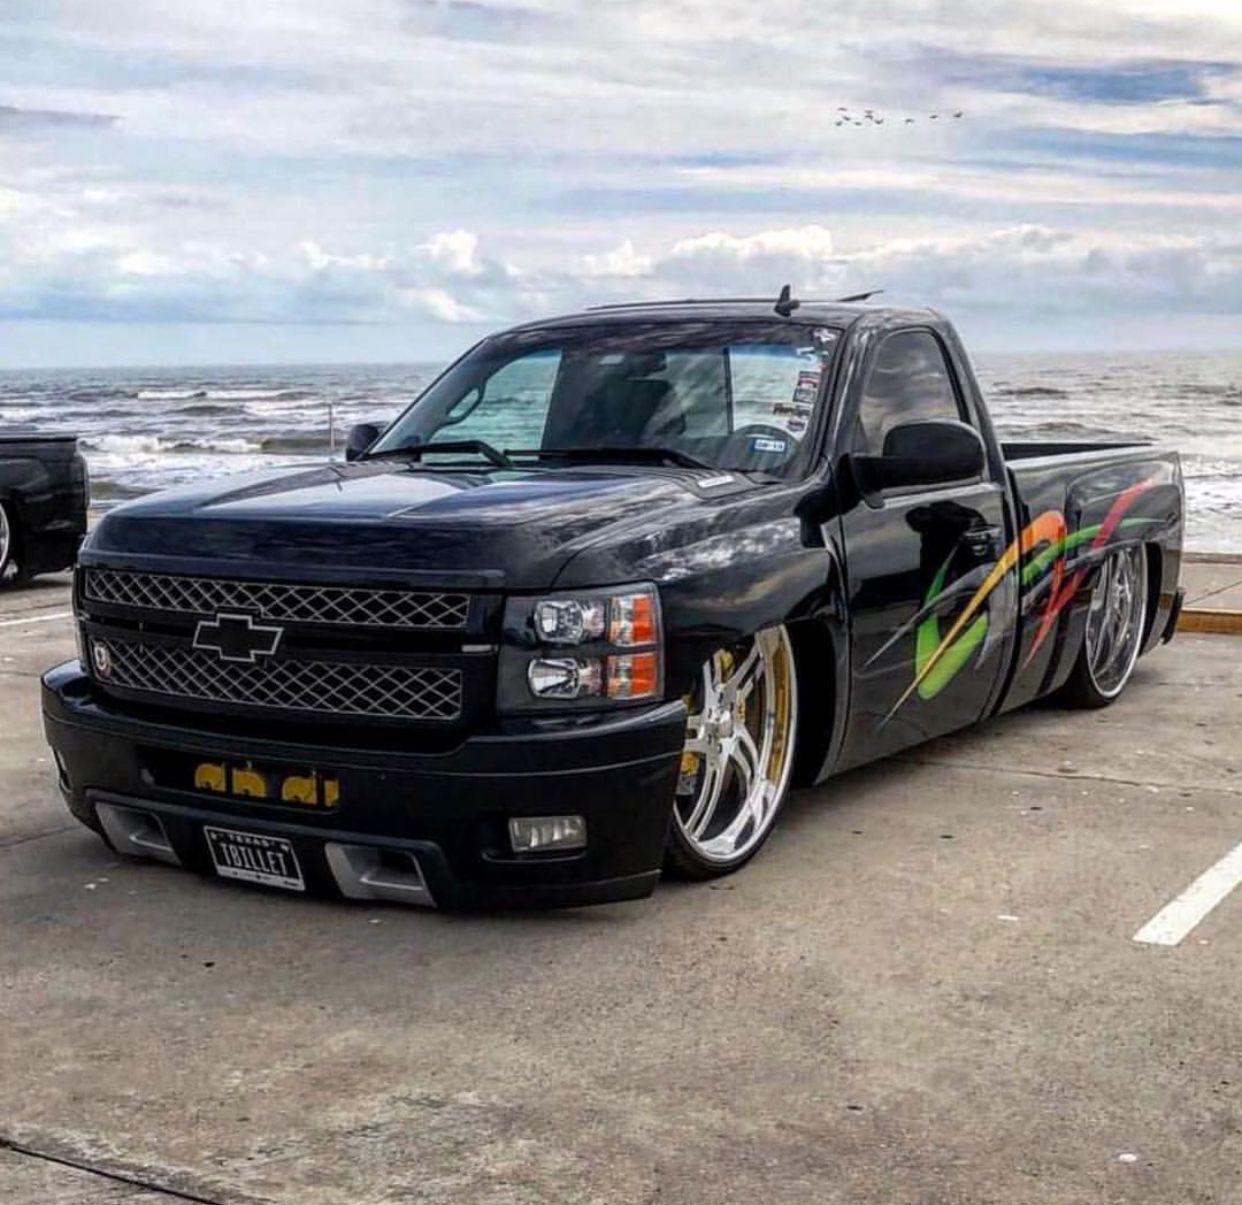 Pin By Nick Campbell On Chevrolet Silverado Gmc Sierra Chevy Trucks Dropped Trucks Lowered Trucks